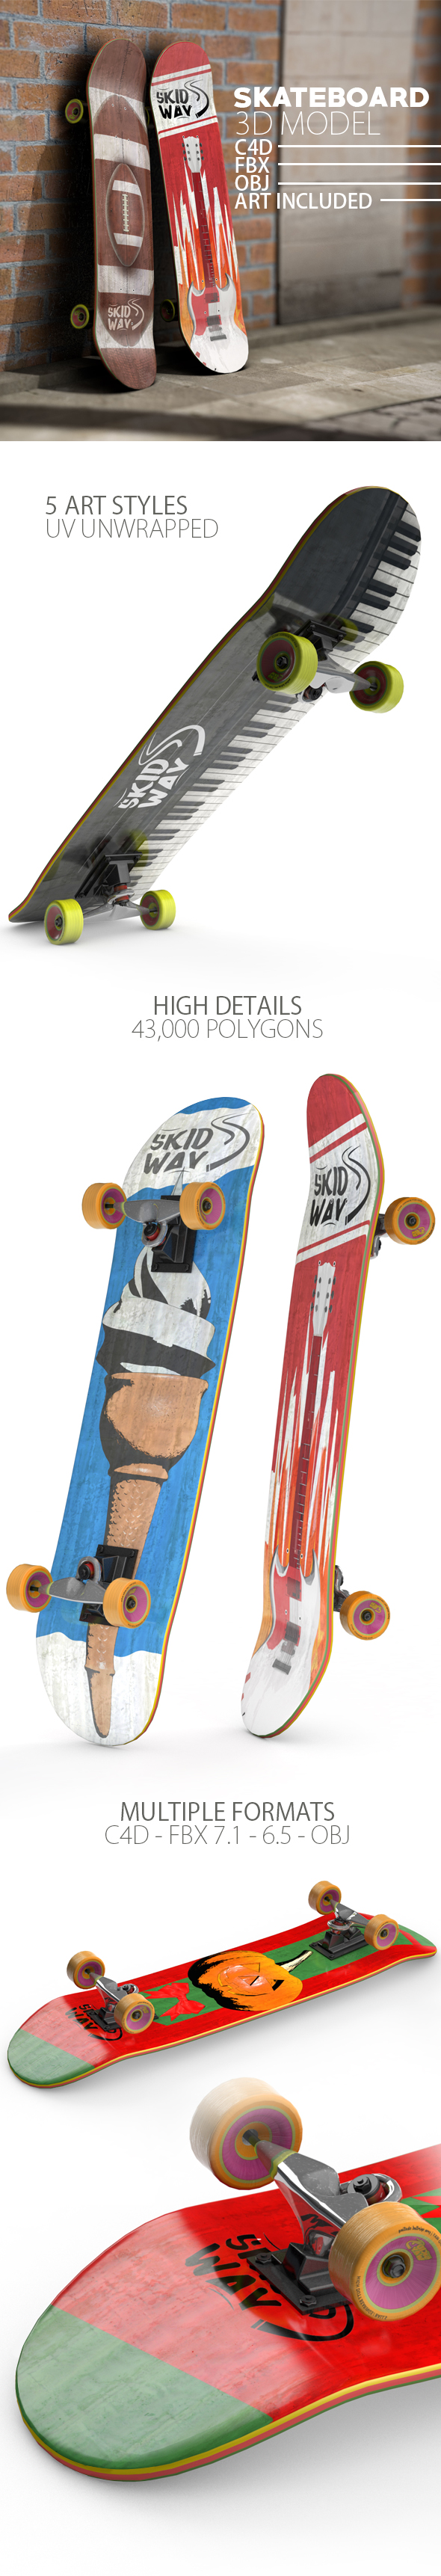 Skateboard Unwrapped 3D Model - 3DOcean Item for Sale